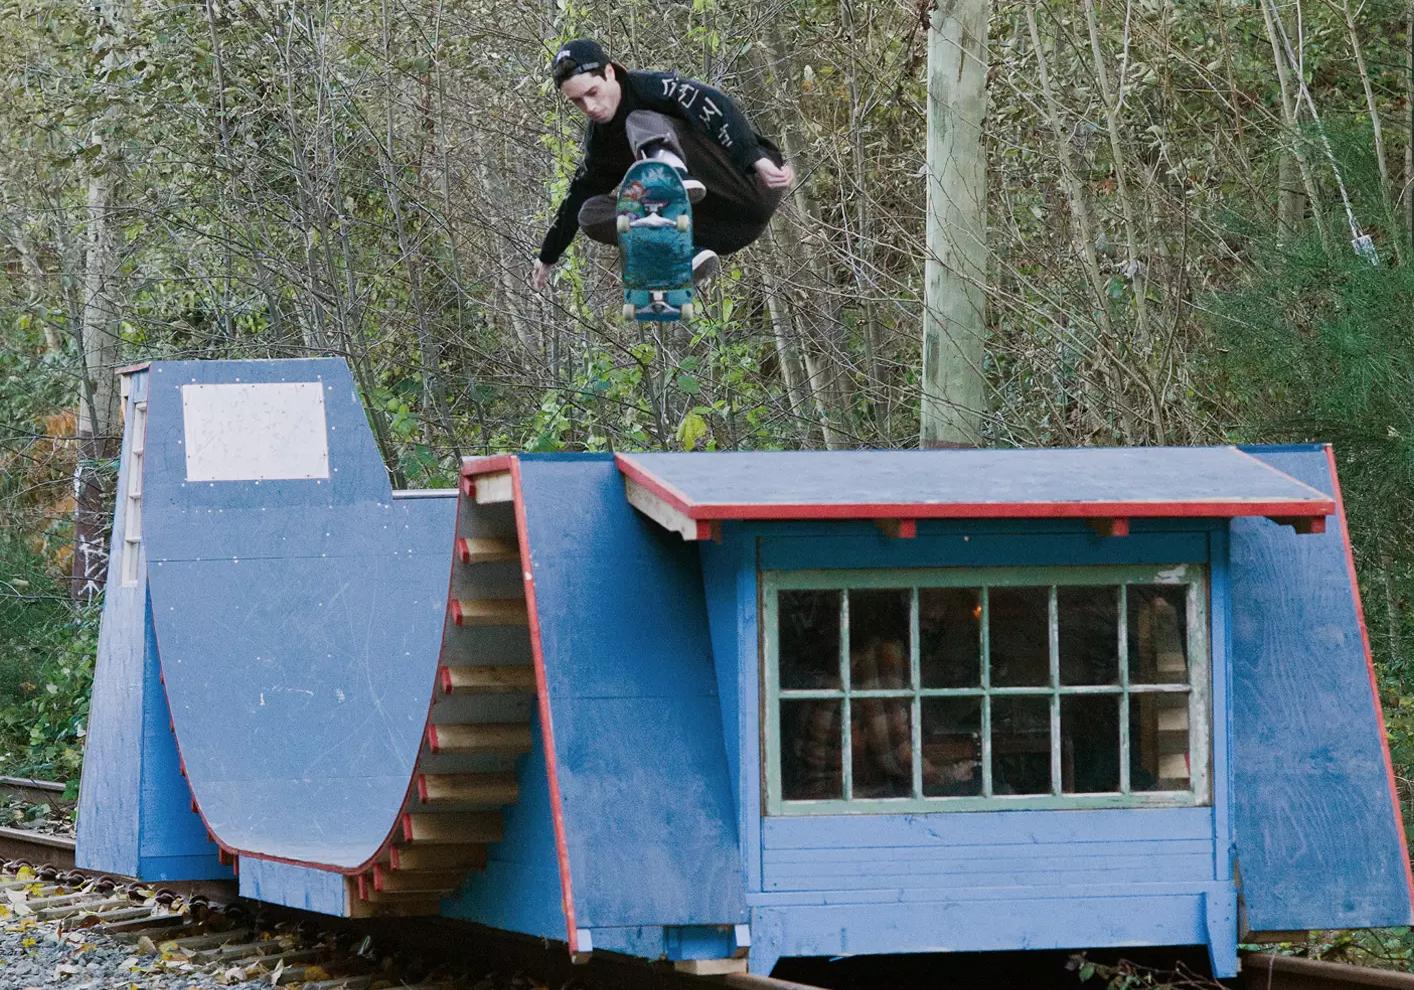 portable skateboard ramps double as train car boat make